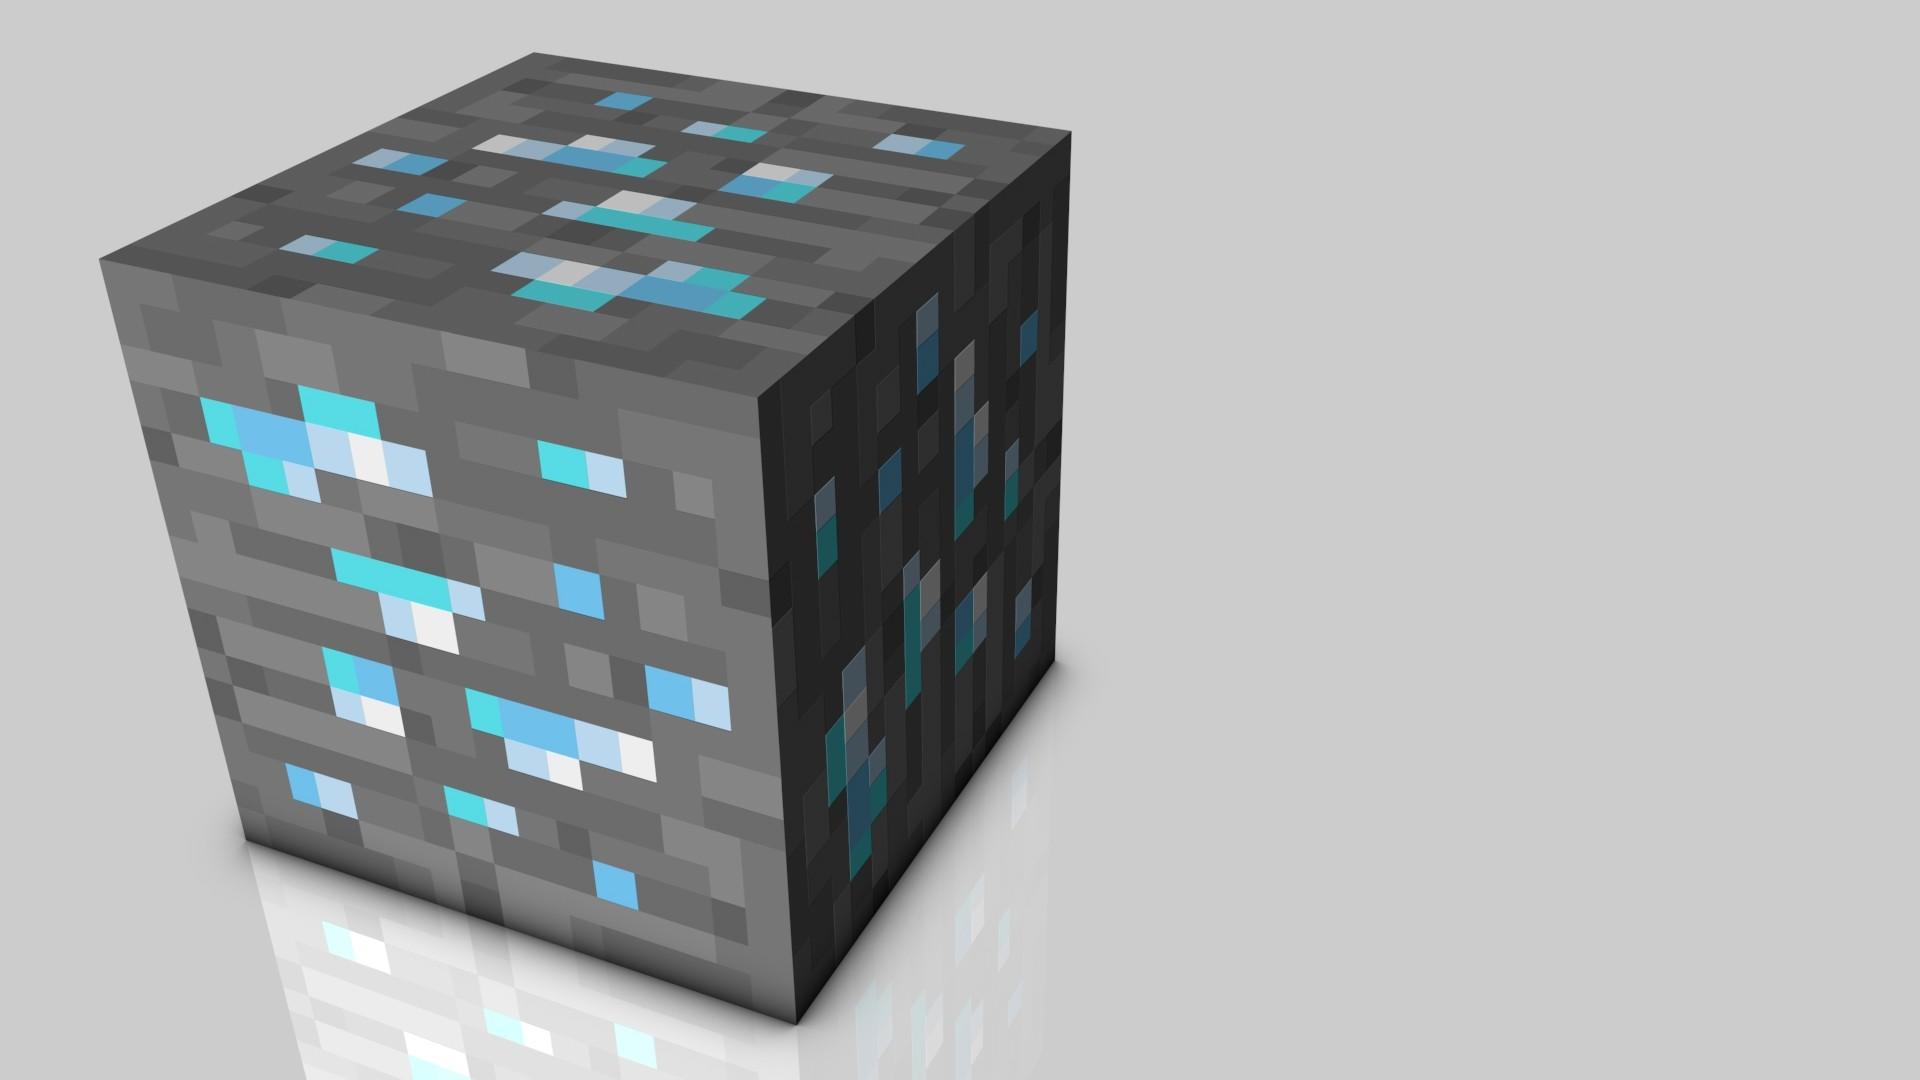 Diamond Minecraft Wallpaper 1920x1080 Diamond Minecraft Block Exone 1920x1080